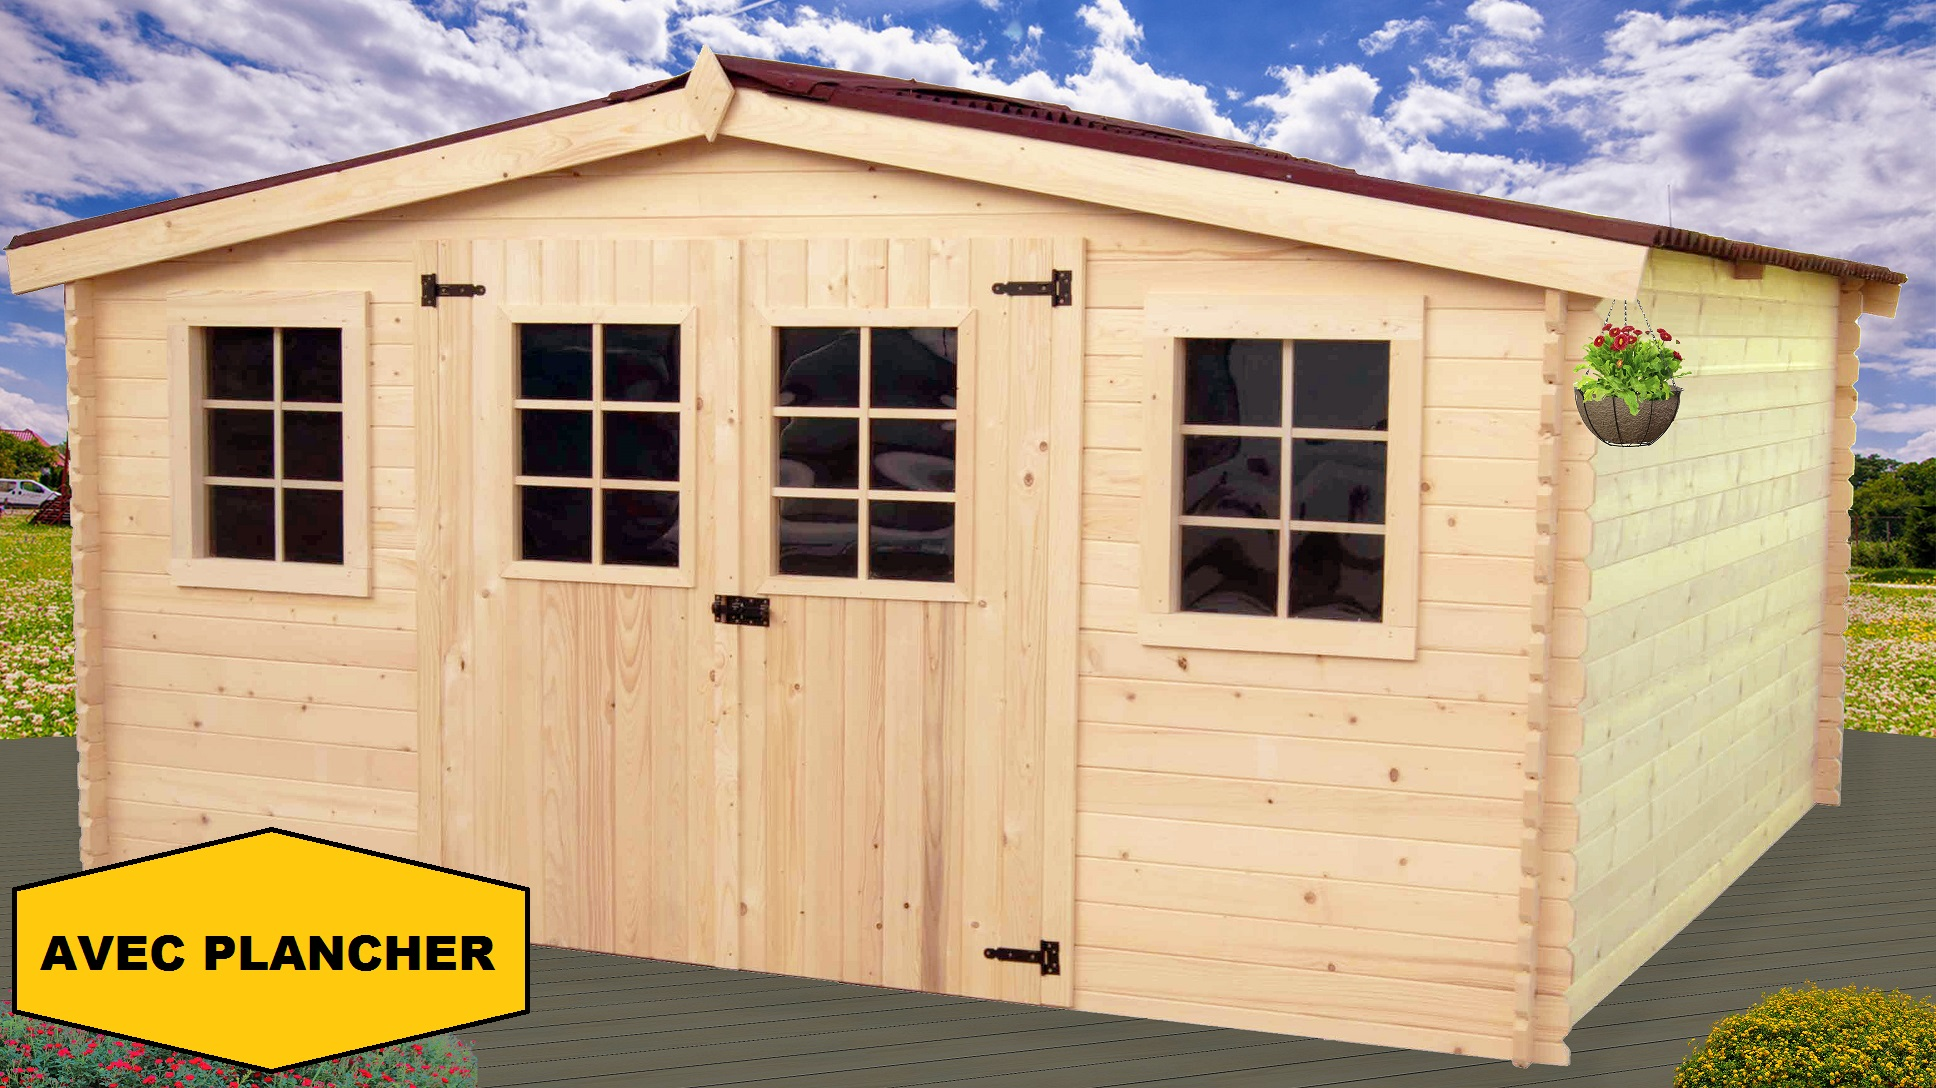 abri de jardin en bois bayonne 4x3 m avec plancher bouvara bouvara des prix. Black Bedroom Furniture Sets. Home Design Ideas